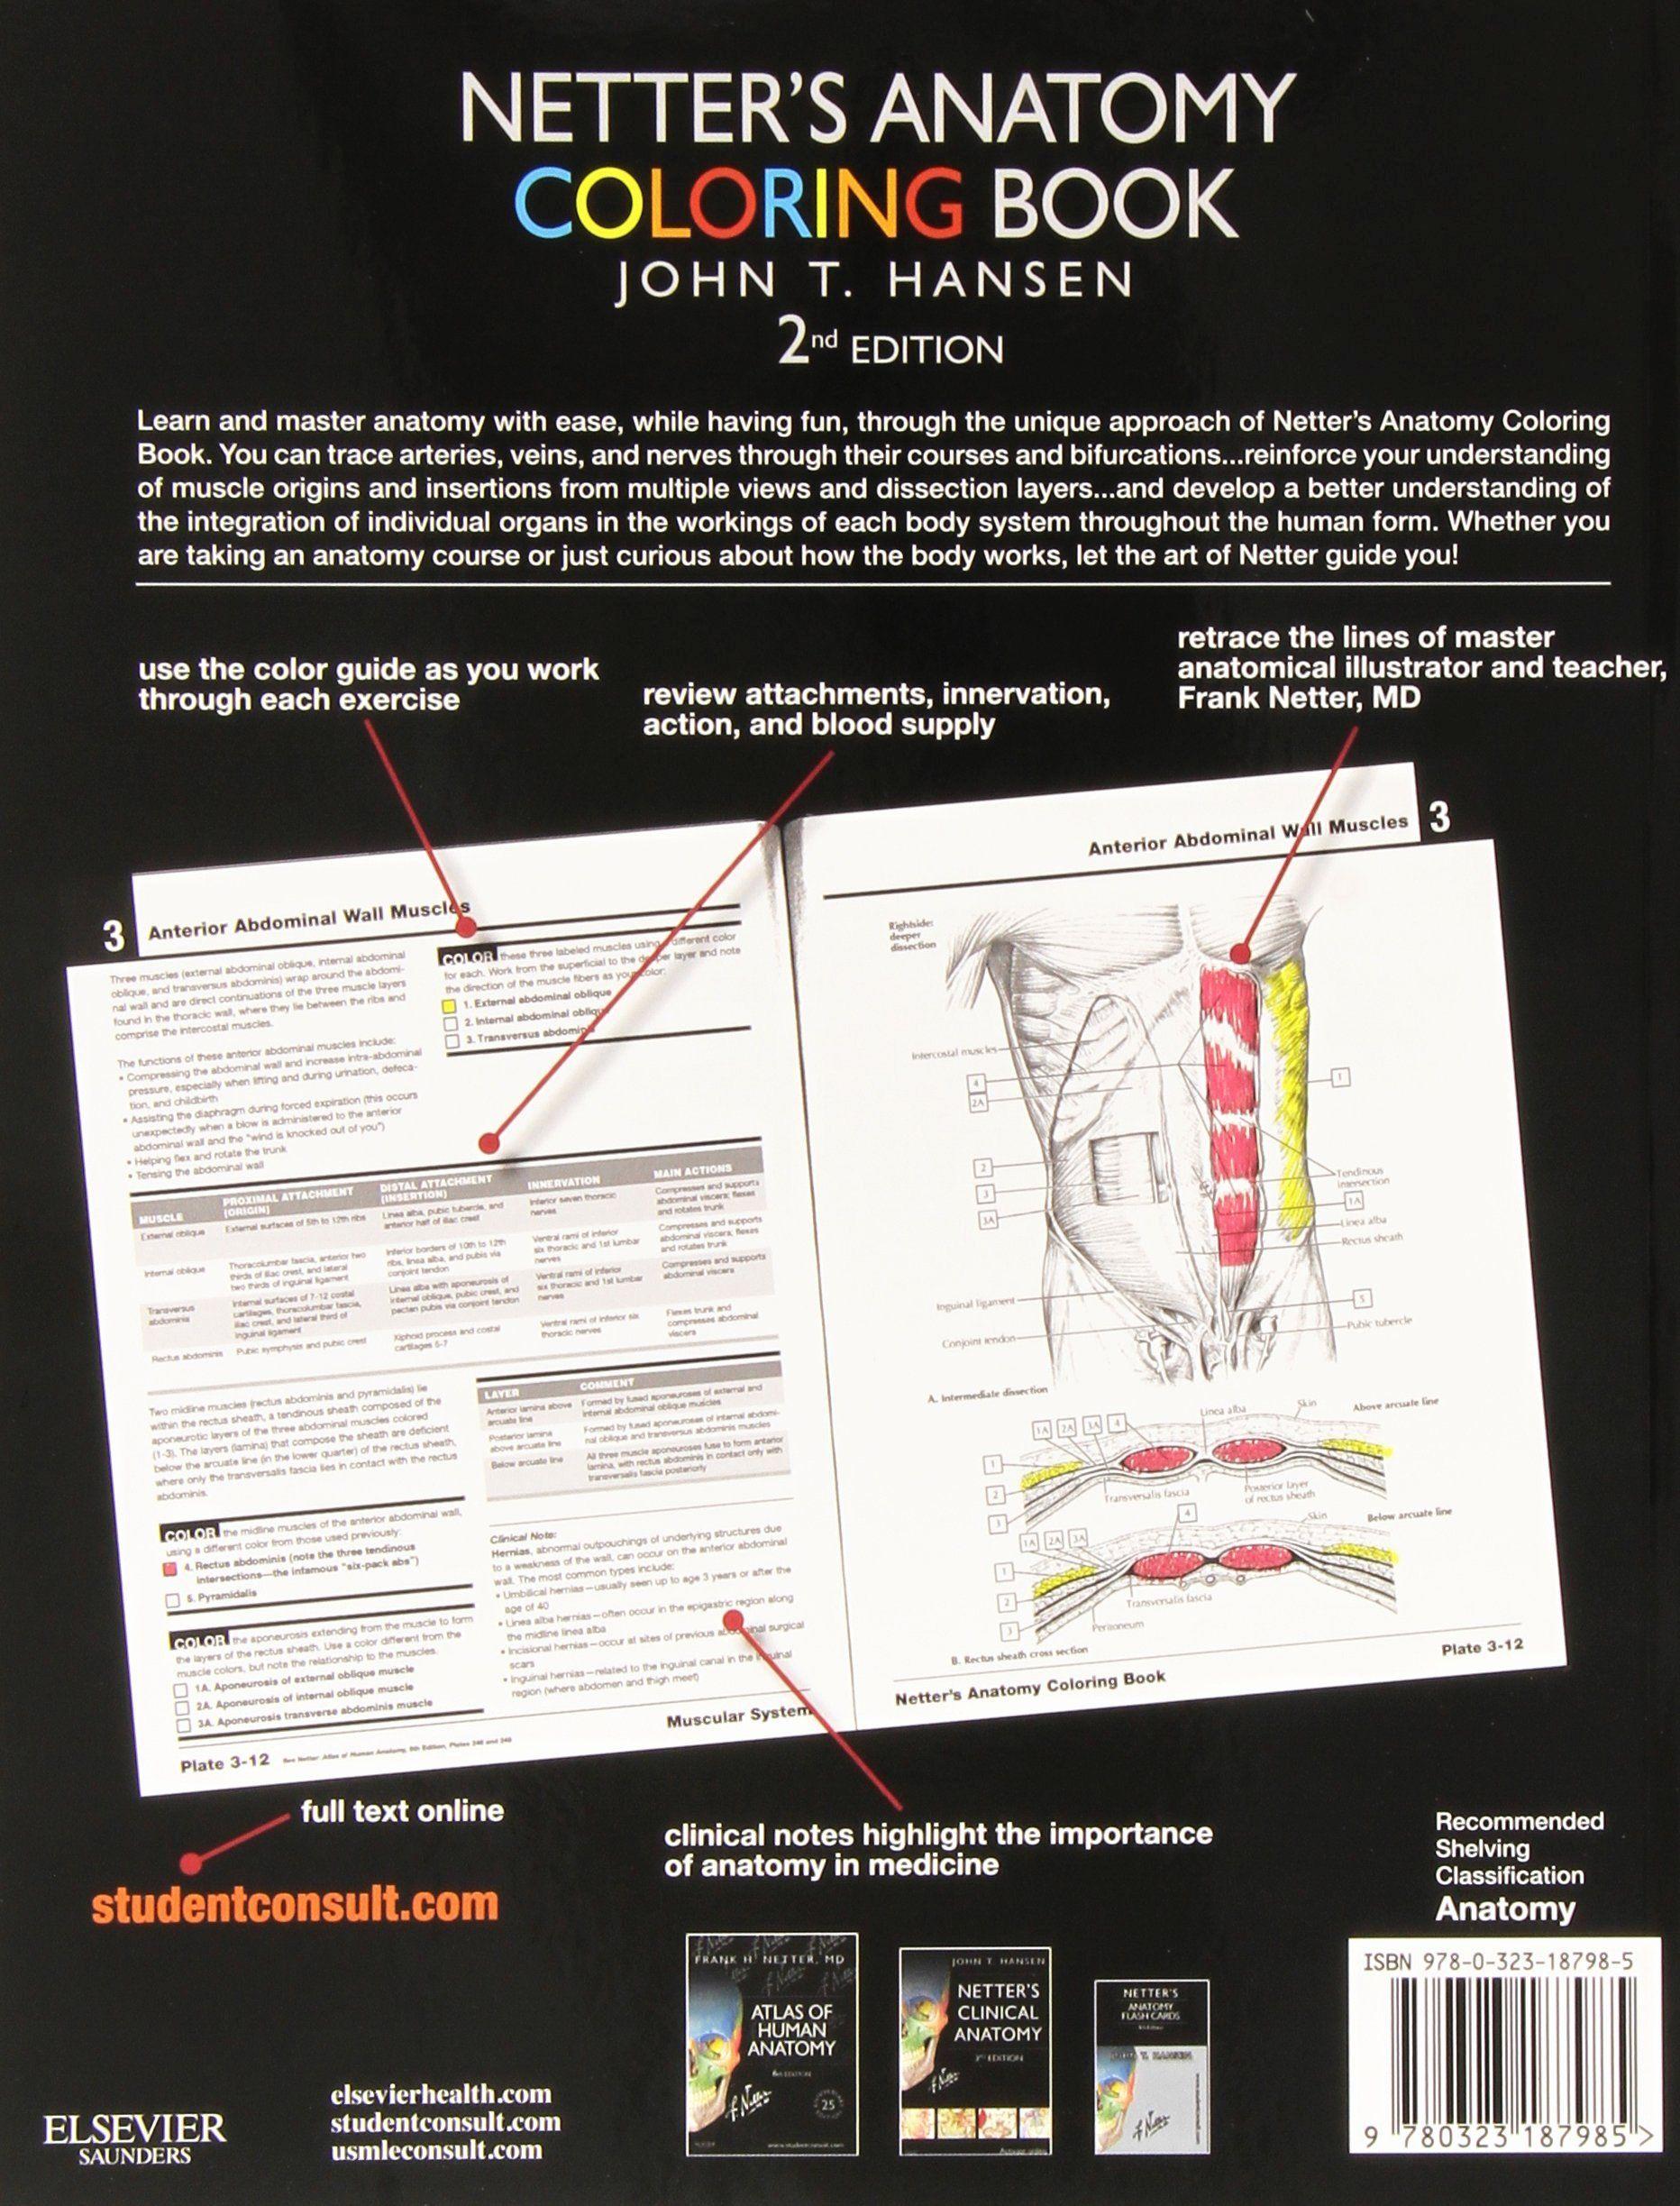 Netter 039 S Anatomy Coloring Book Beautiful Netter S Anatomy Coloring Book With Student Consult Acc Anatomy Coloring Book Stress Coloring Book Coloring Books